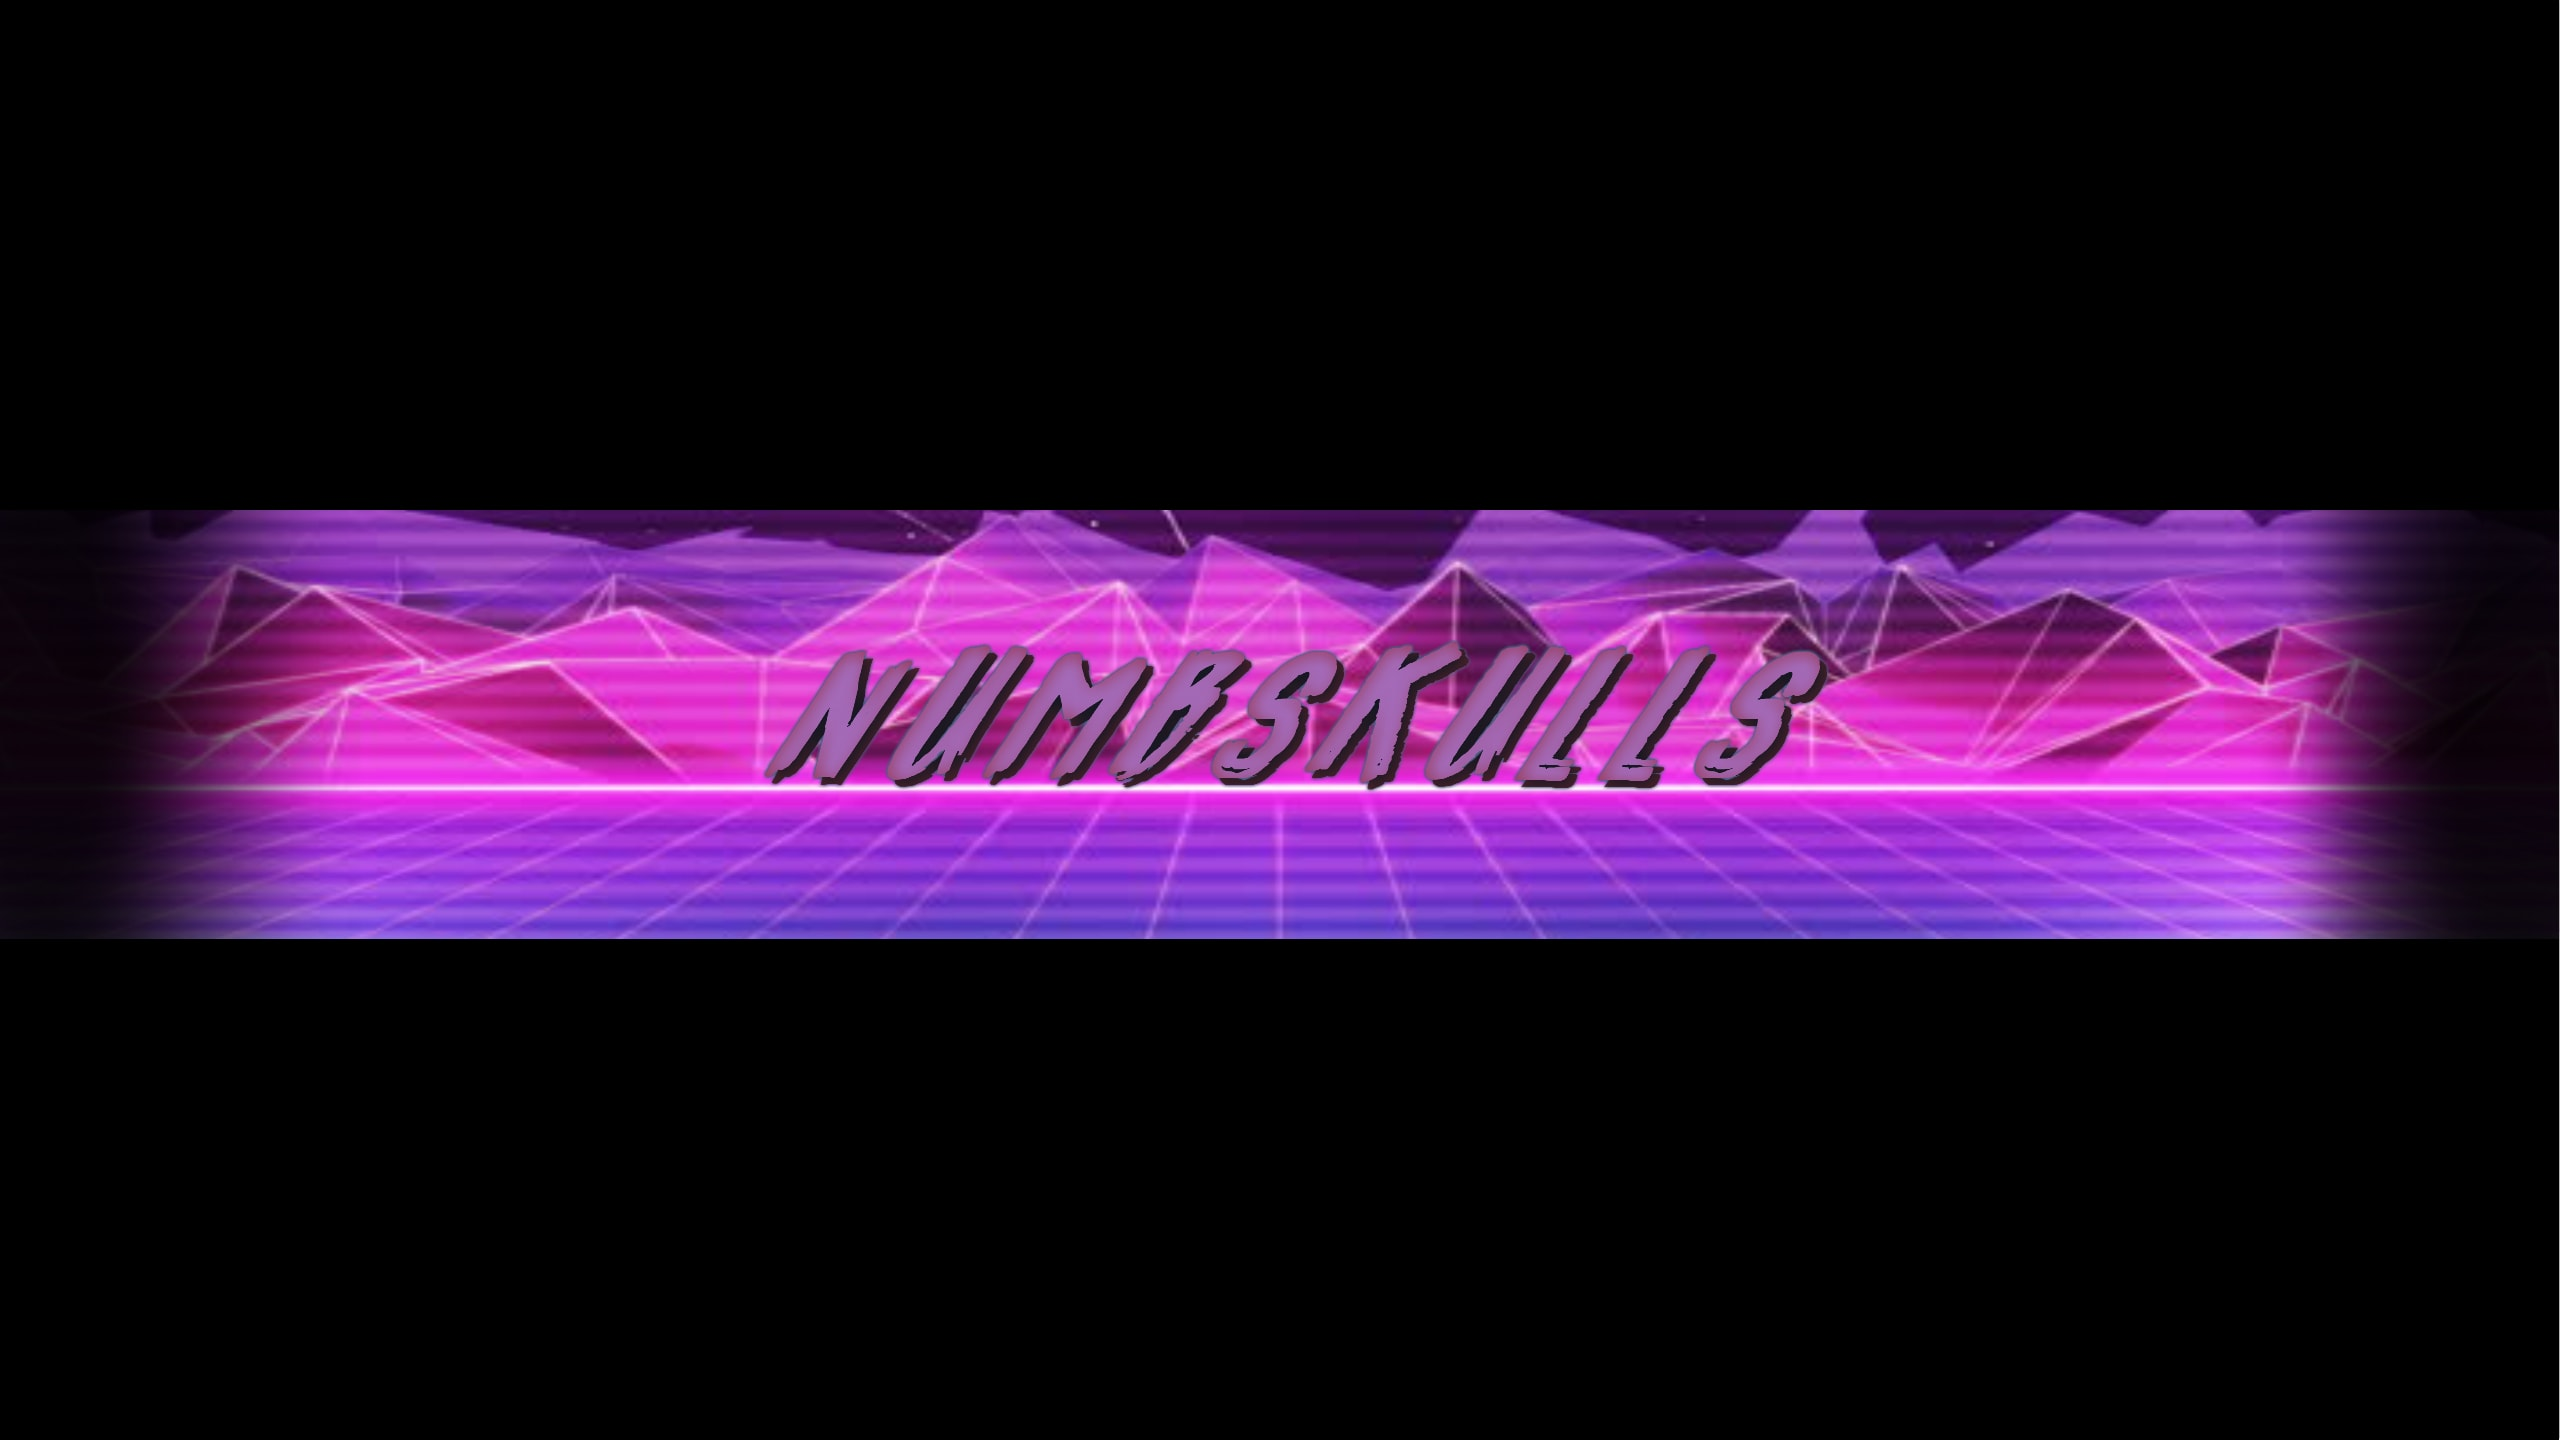 Fortnite Youtube Channel Art 2560x1440 Fortnite Free Pass 7